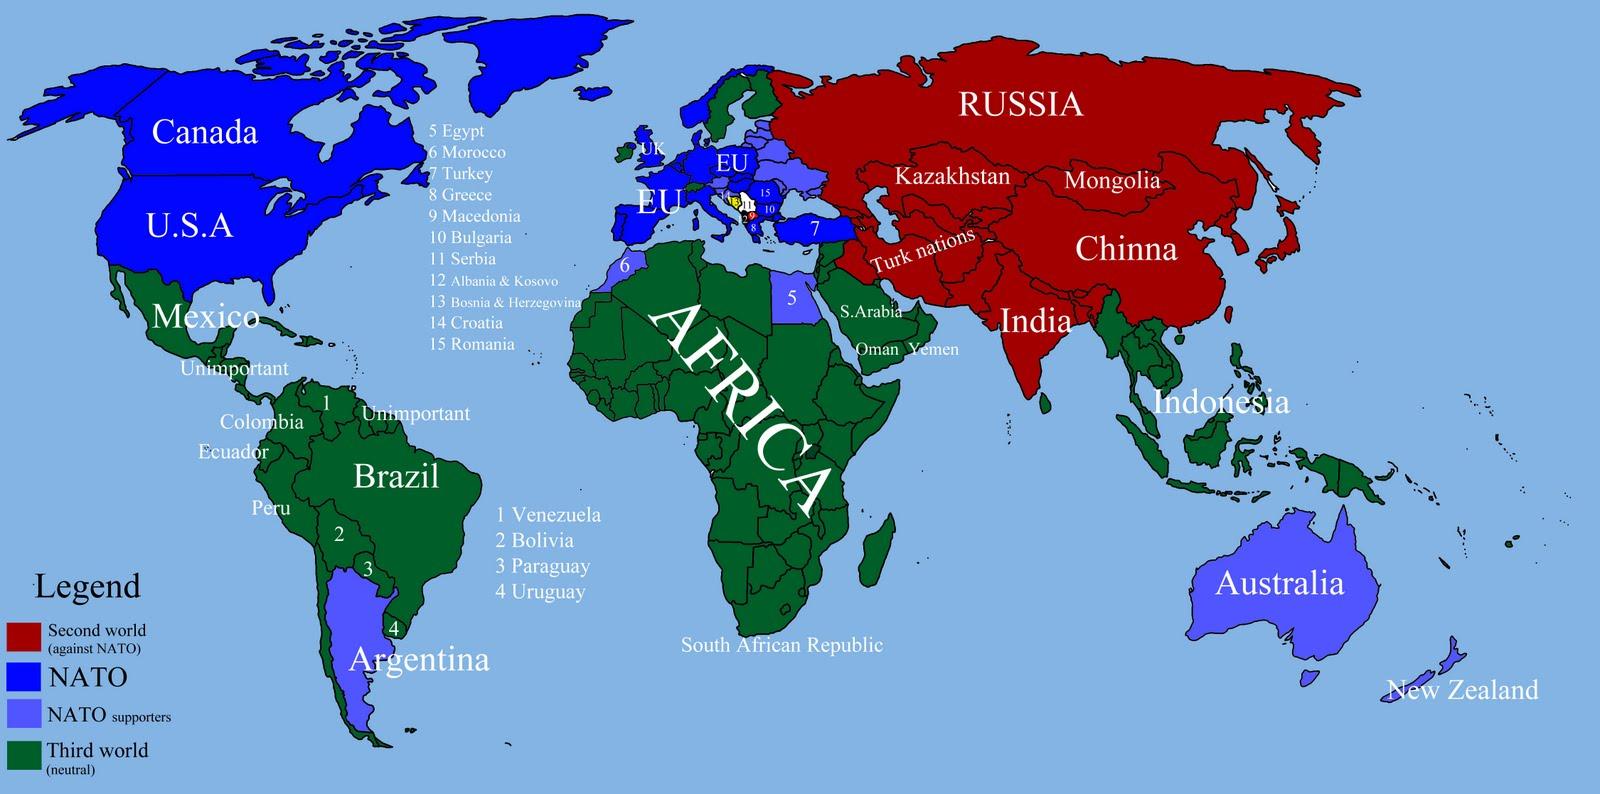 World War 3 Simulation Map Related Keywords - World War 3 ...